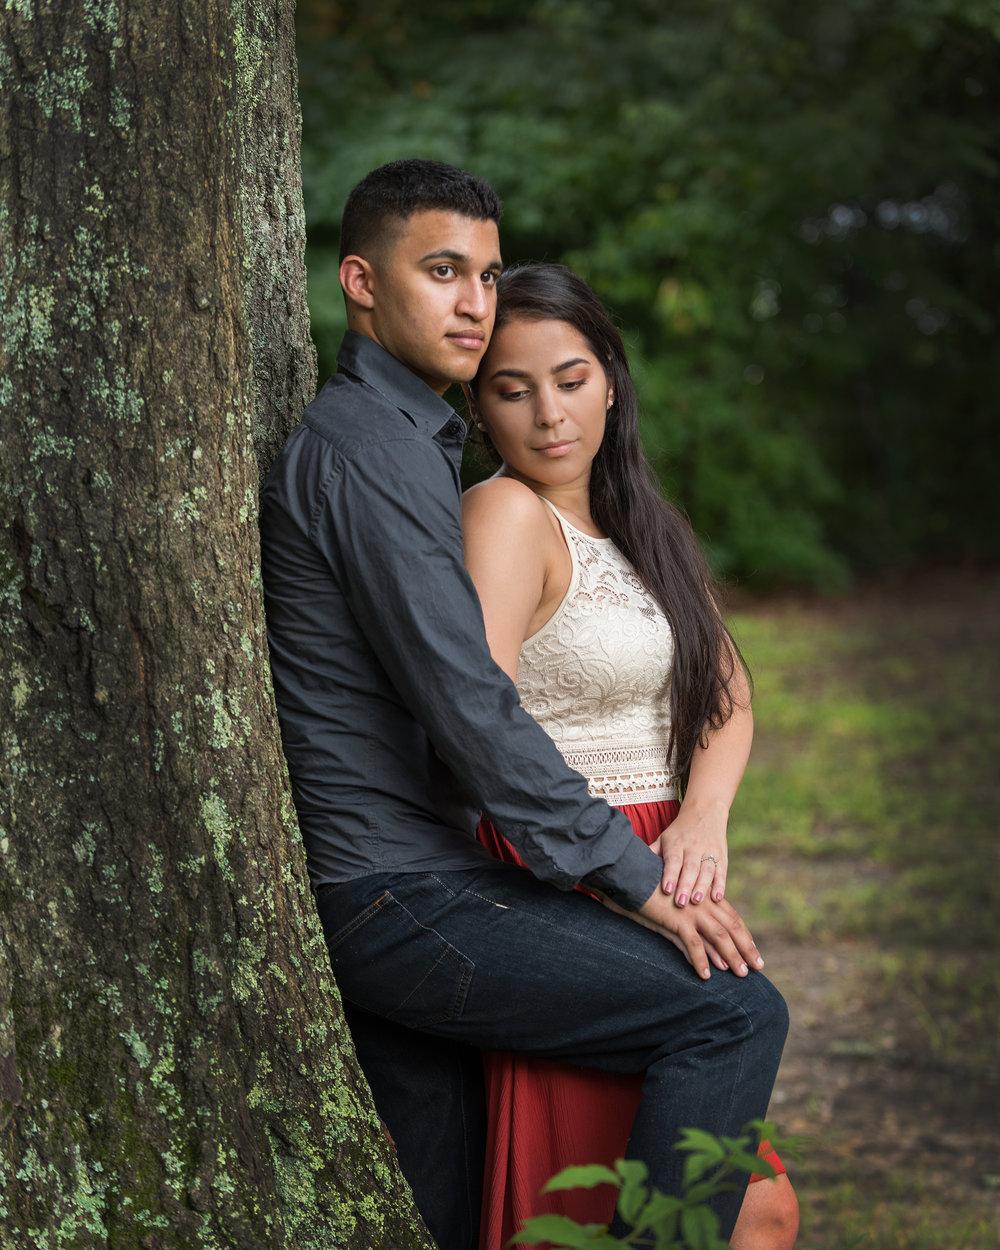 Kennesaw GA Engagement Photography